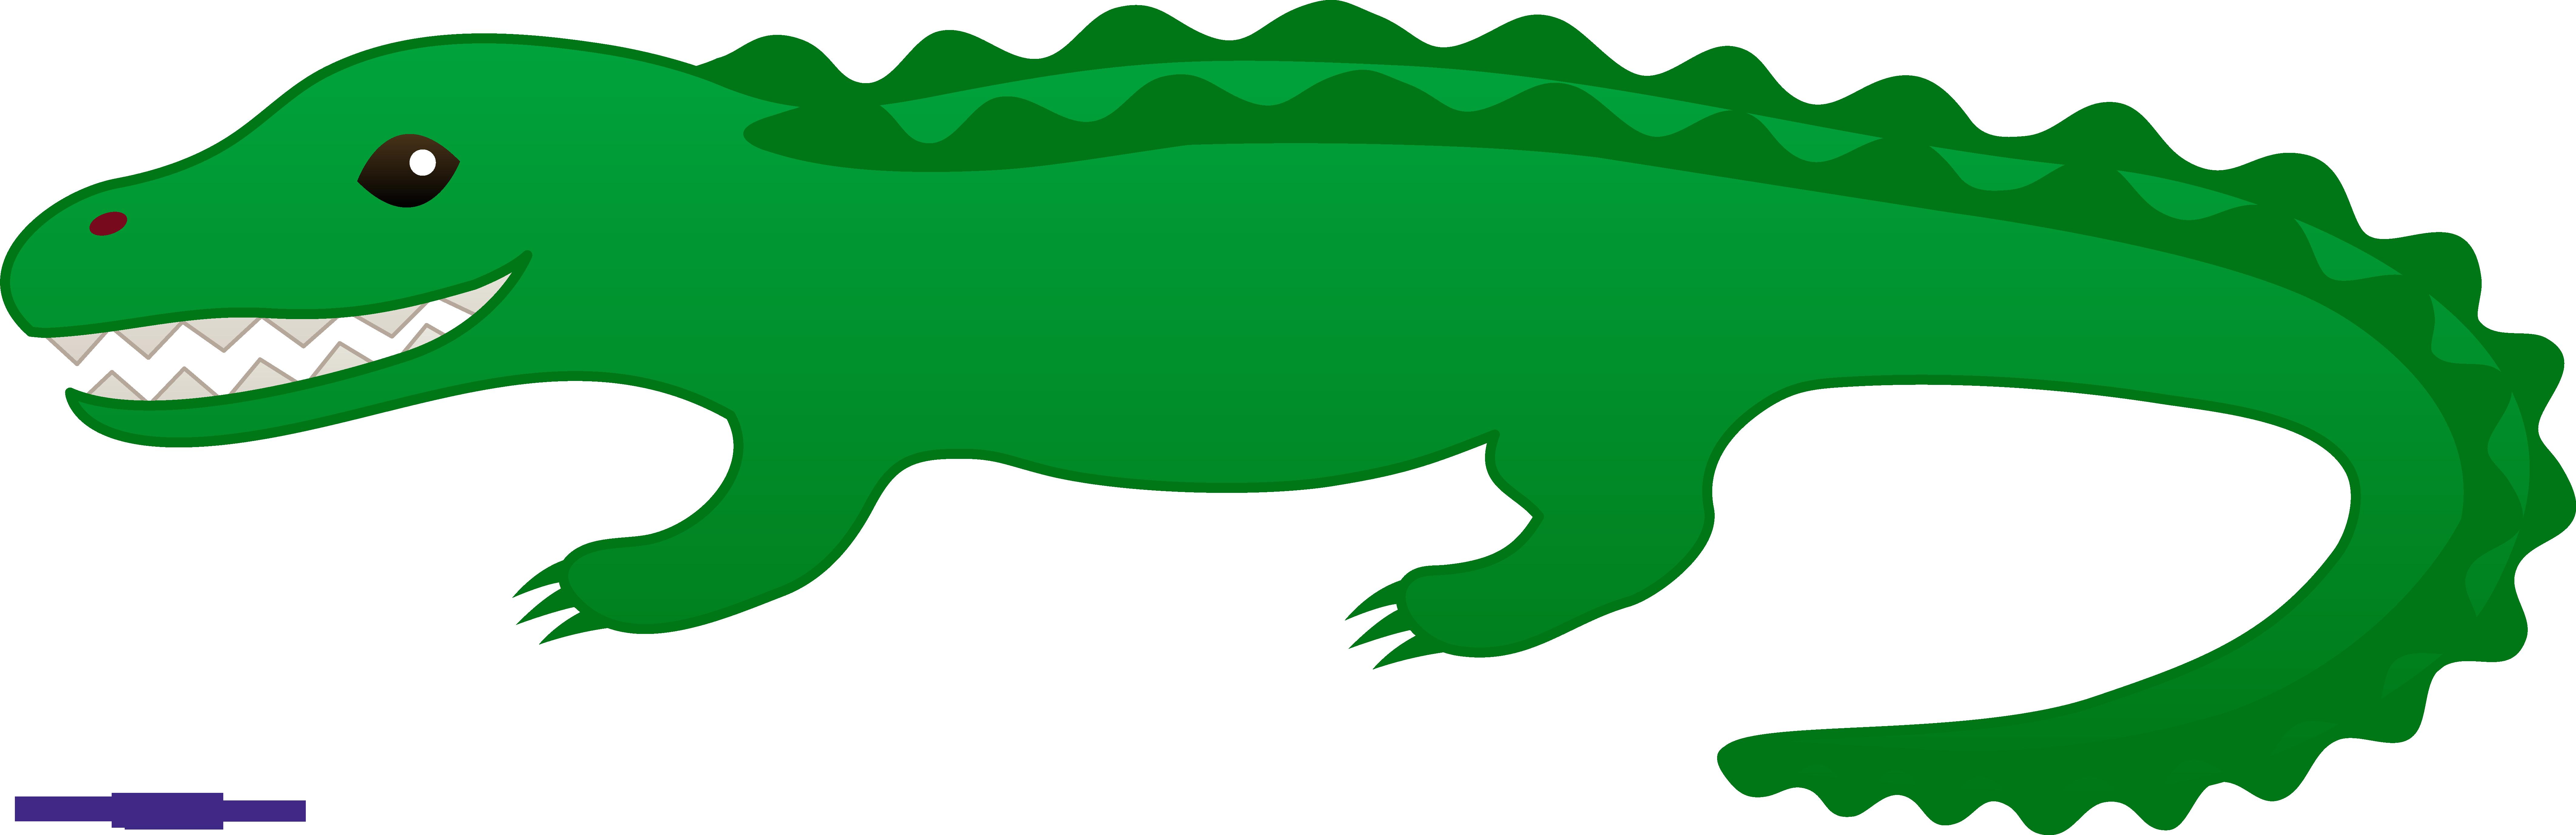 Clipart animals alligator, Clipart animals alligator.